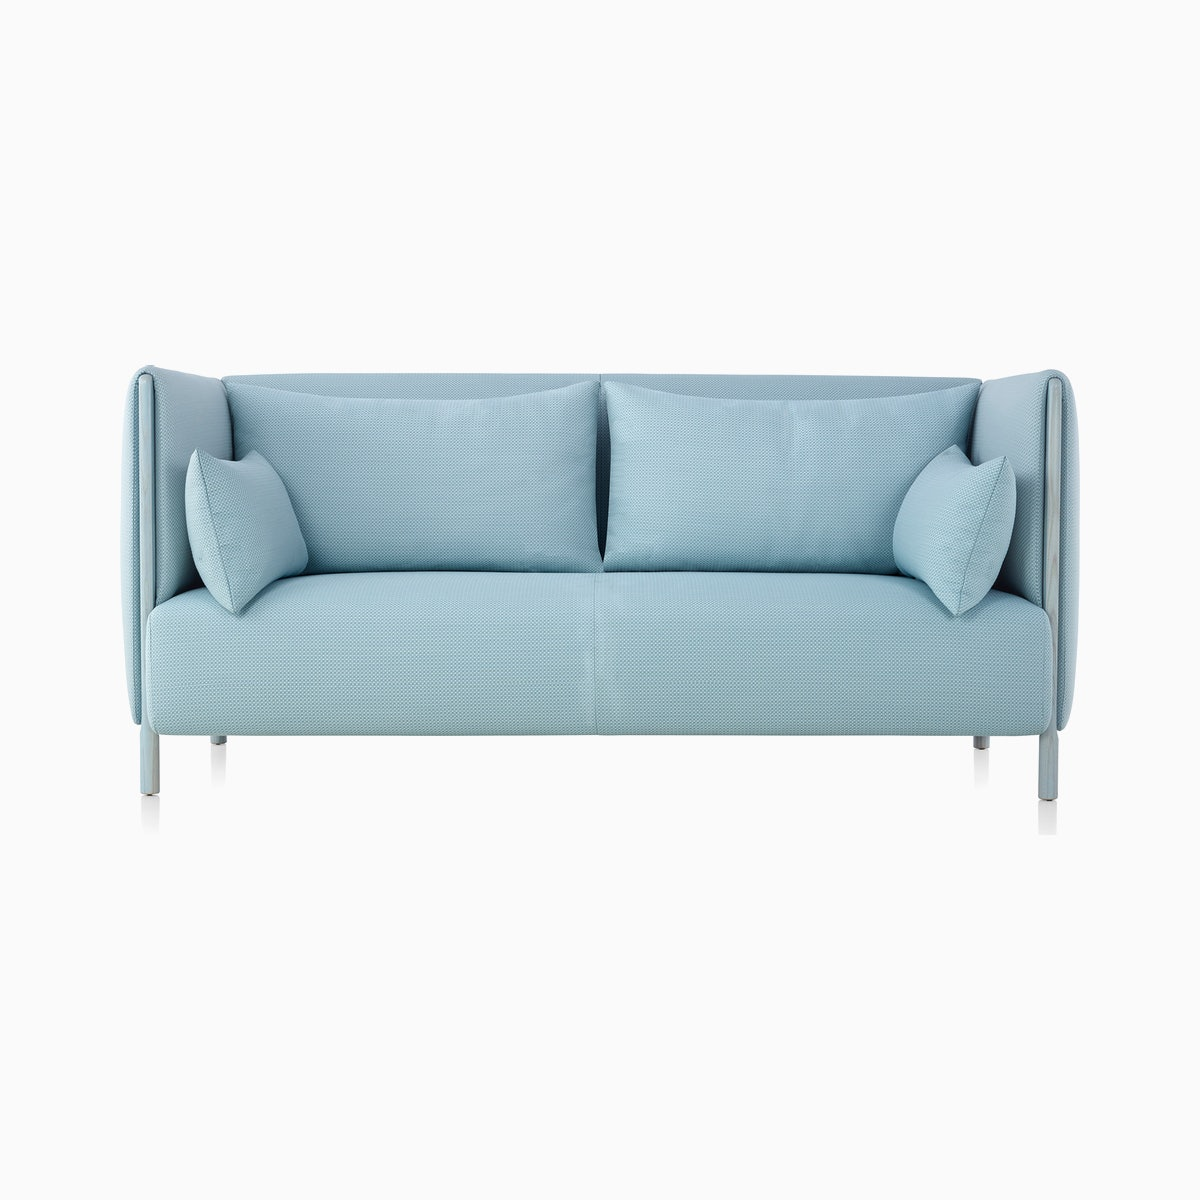 ColourForm Two-Seater Sofa